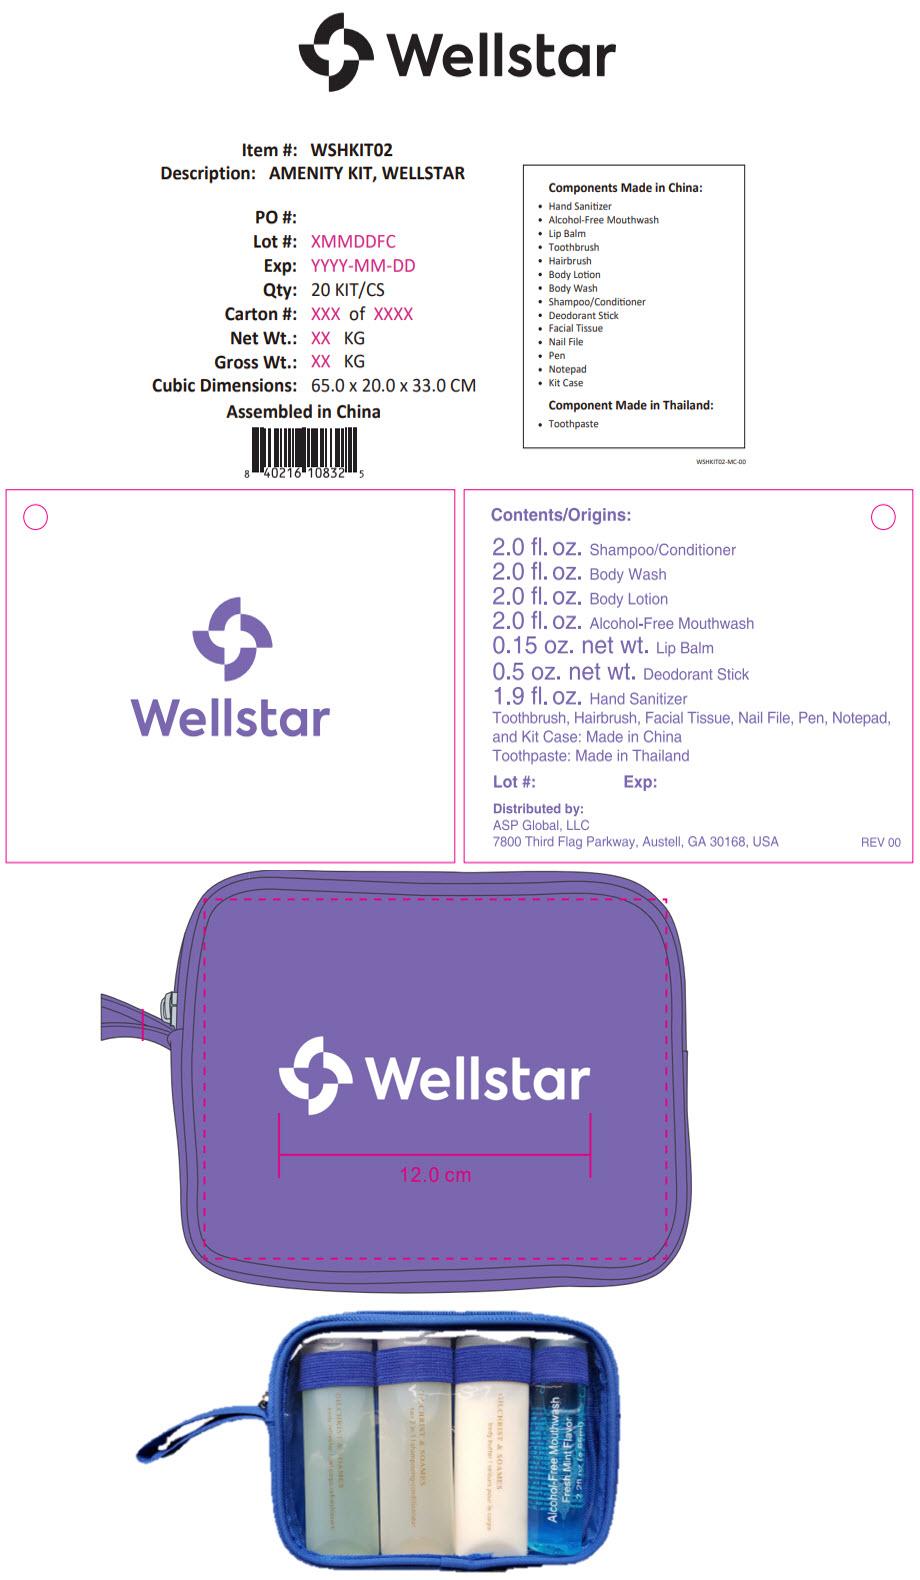 PRINCIPAL DISPLAY PANEL - Kit Label